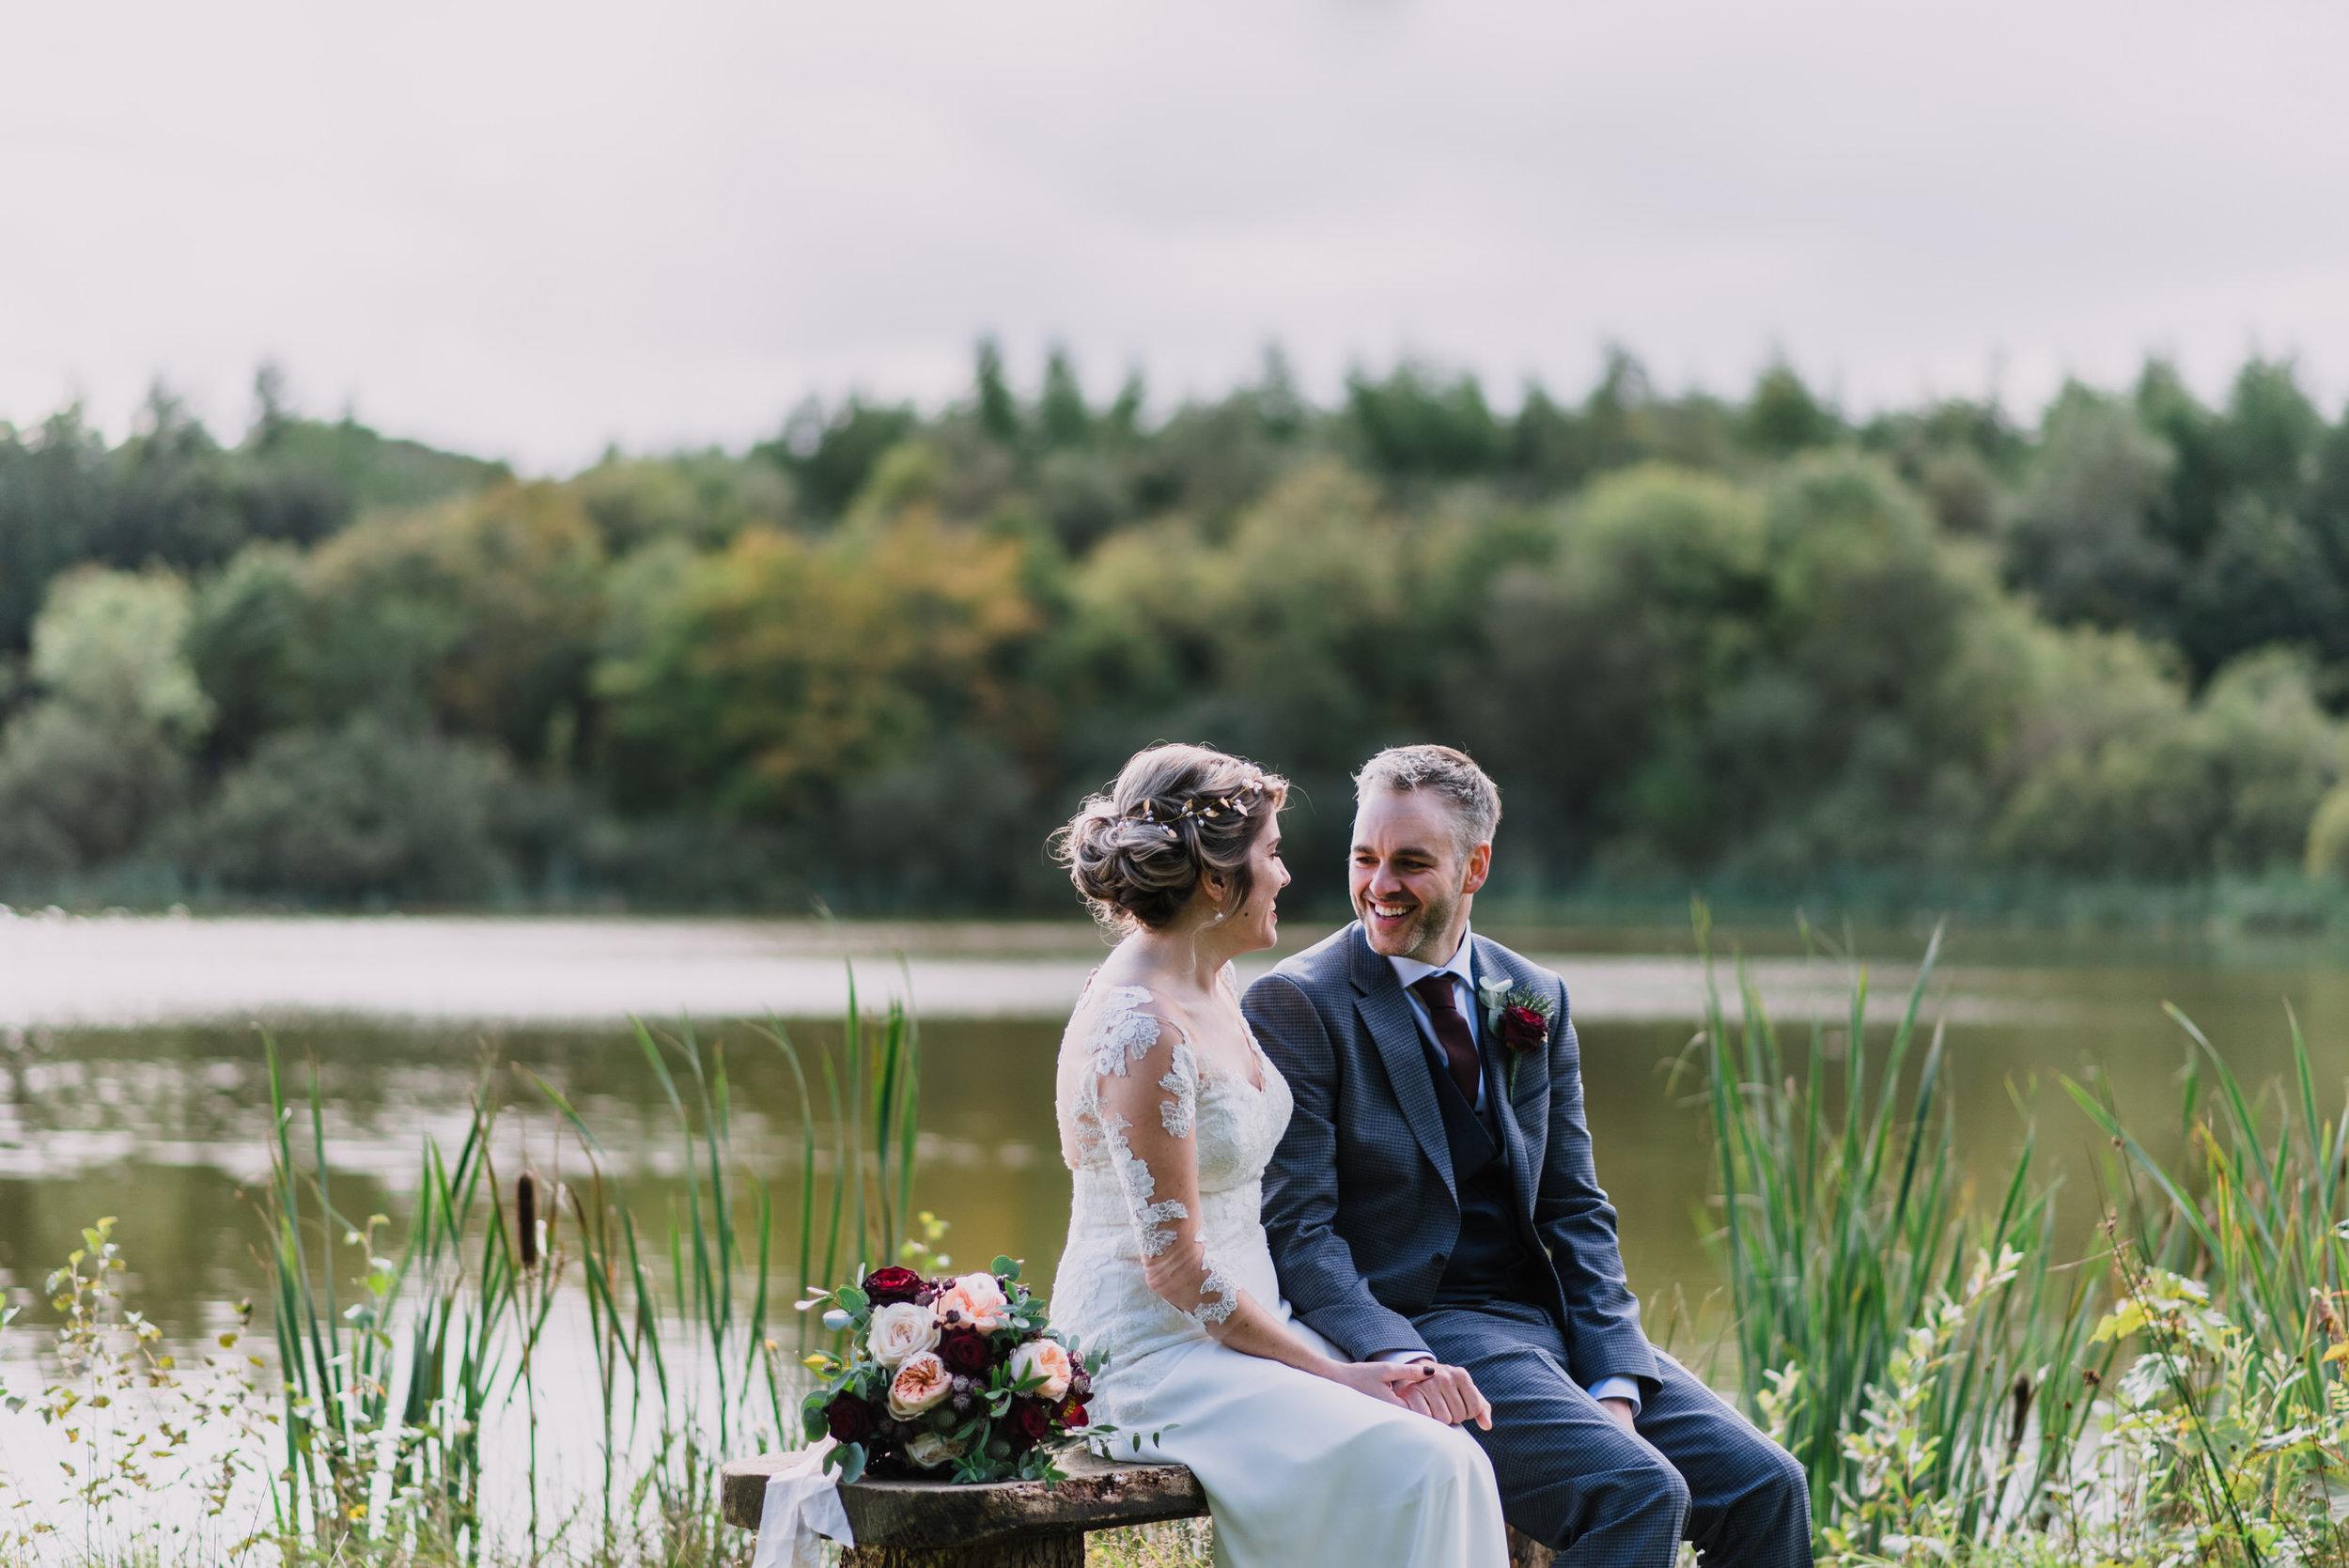 lissanoure castle wedding, northern ireland wedding photographer, romantic northern irish wedding venue, castle wedding ireland, natural wedding photography ni (84).jpg